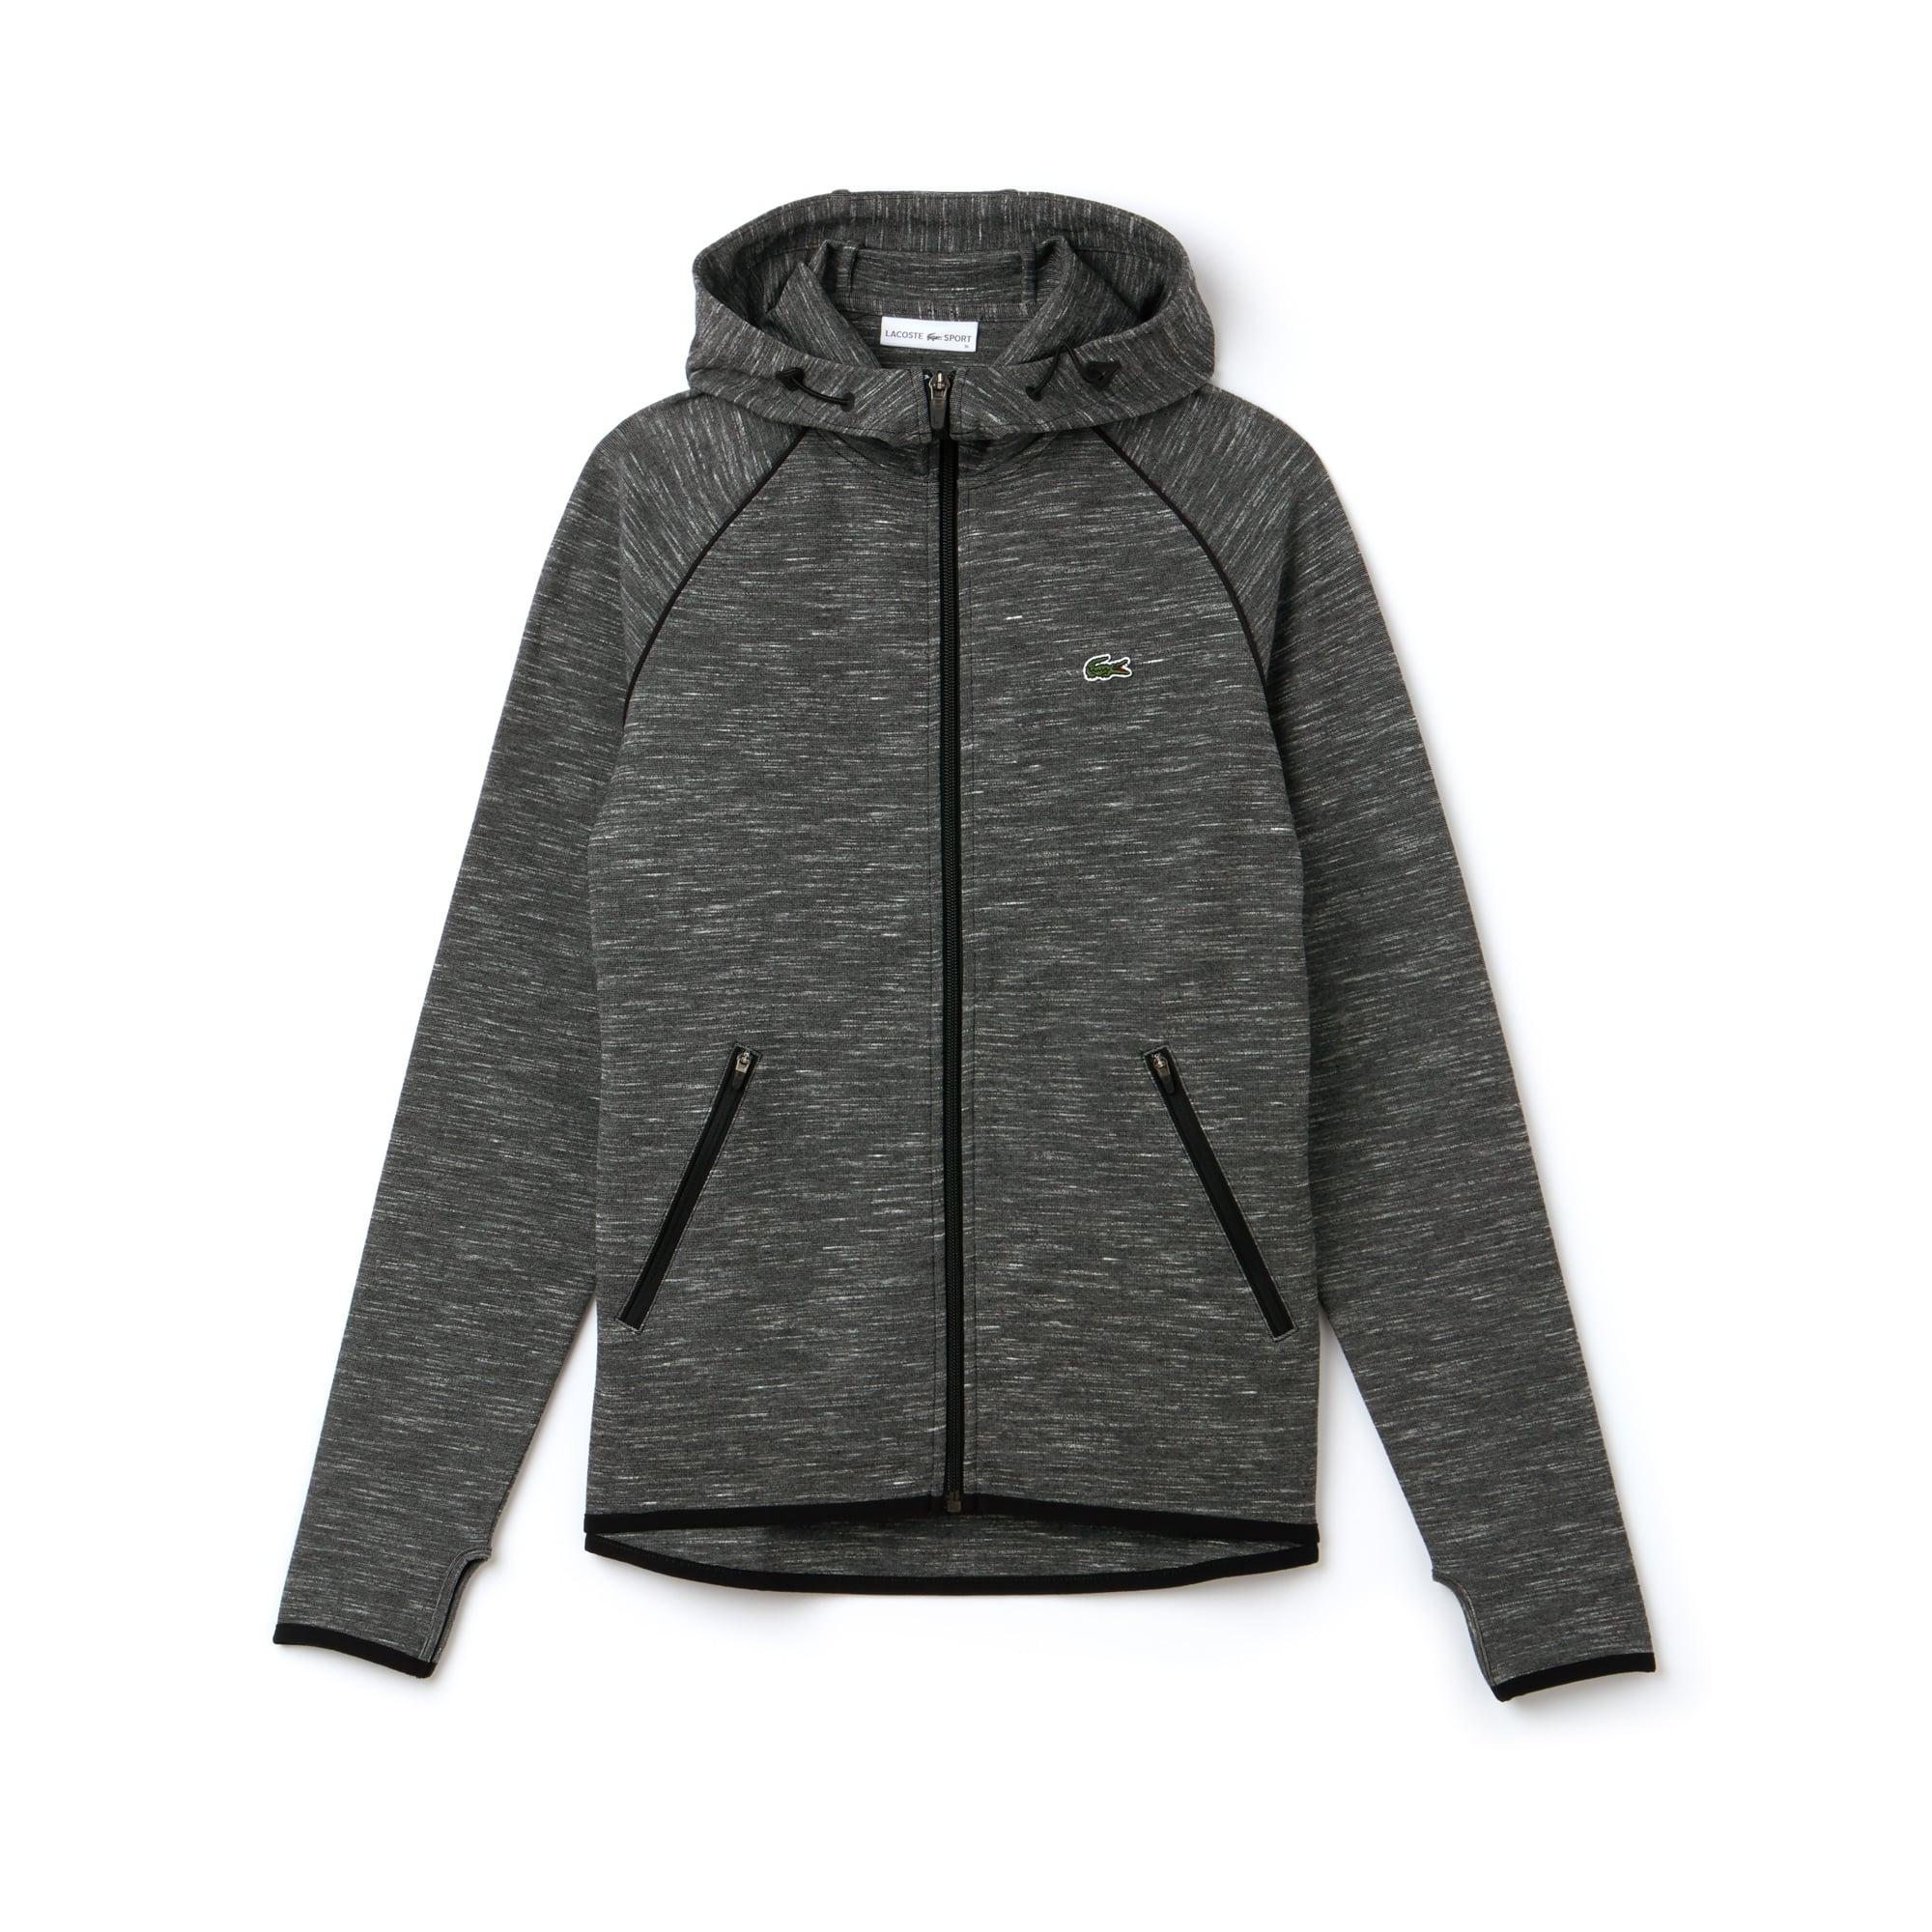 Women's Lacoste SPORT Hooded Zip Piped Tennis Sweatshirt